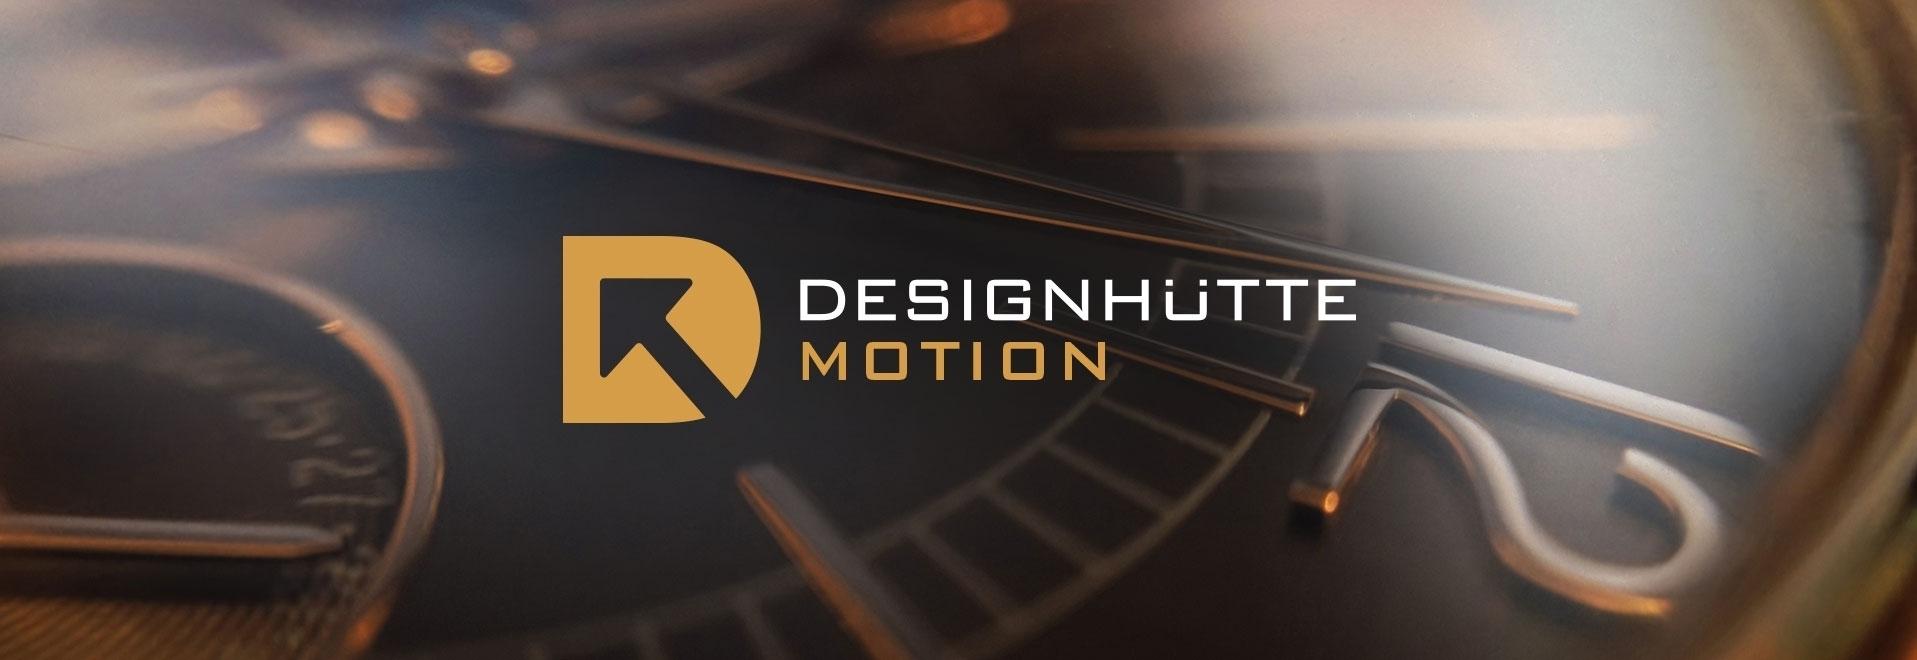 Designhütte Motion - Up-to-date information